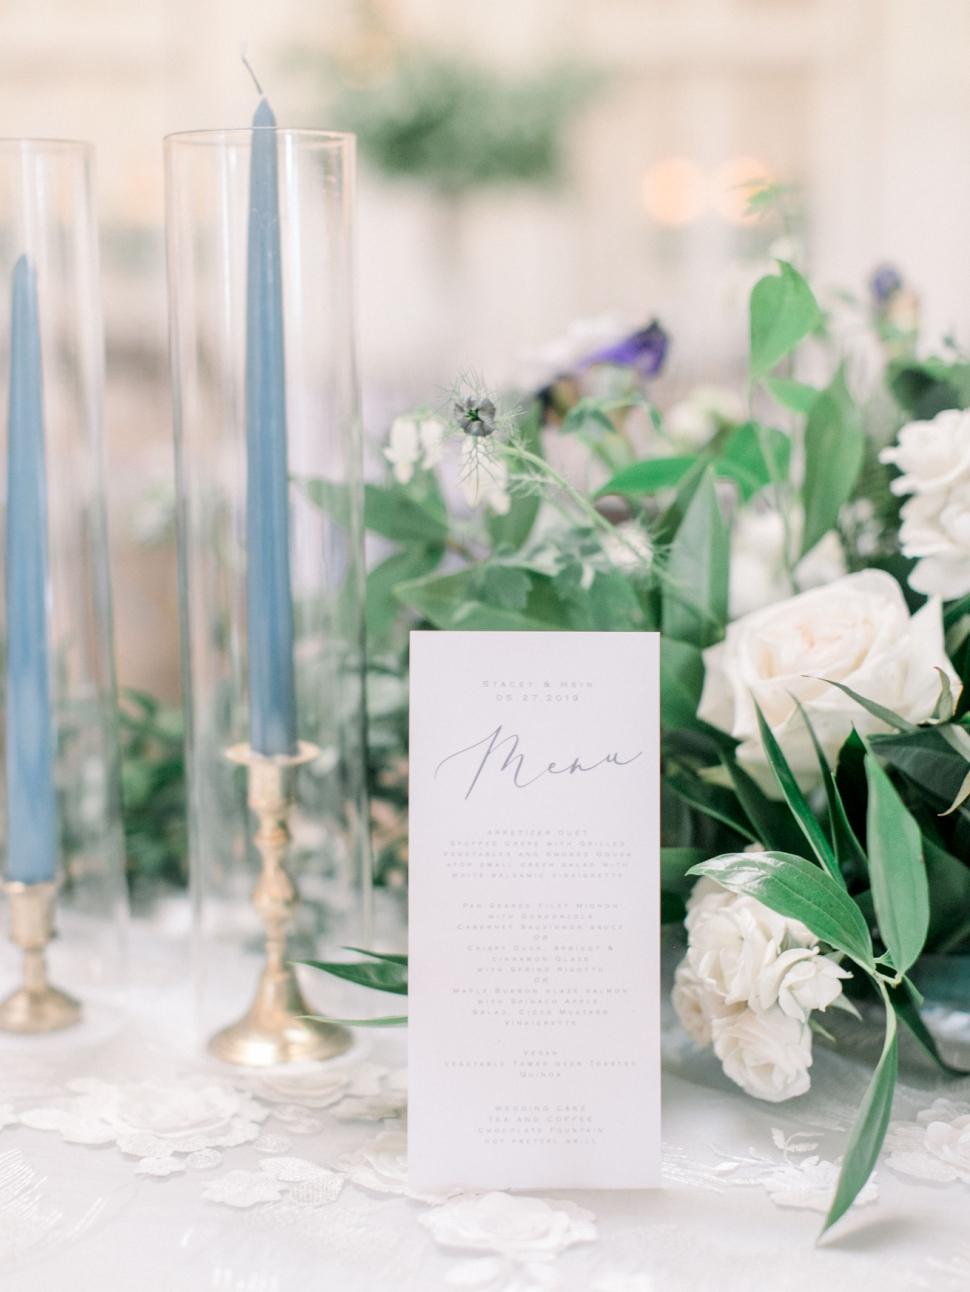 Bourne-Mansion-Wedding-Photos-Cassi-Claire-Long-Island-Wedding-Photographer_42.jpg